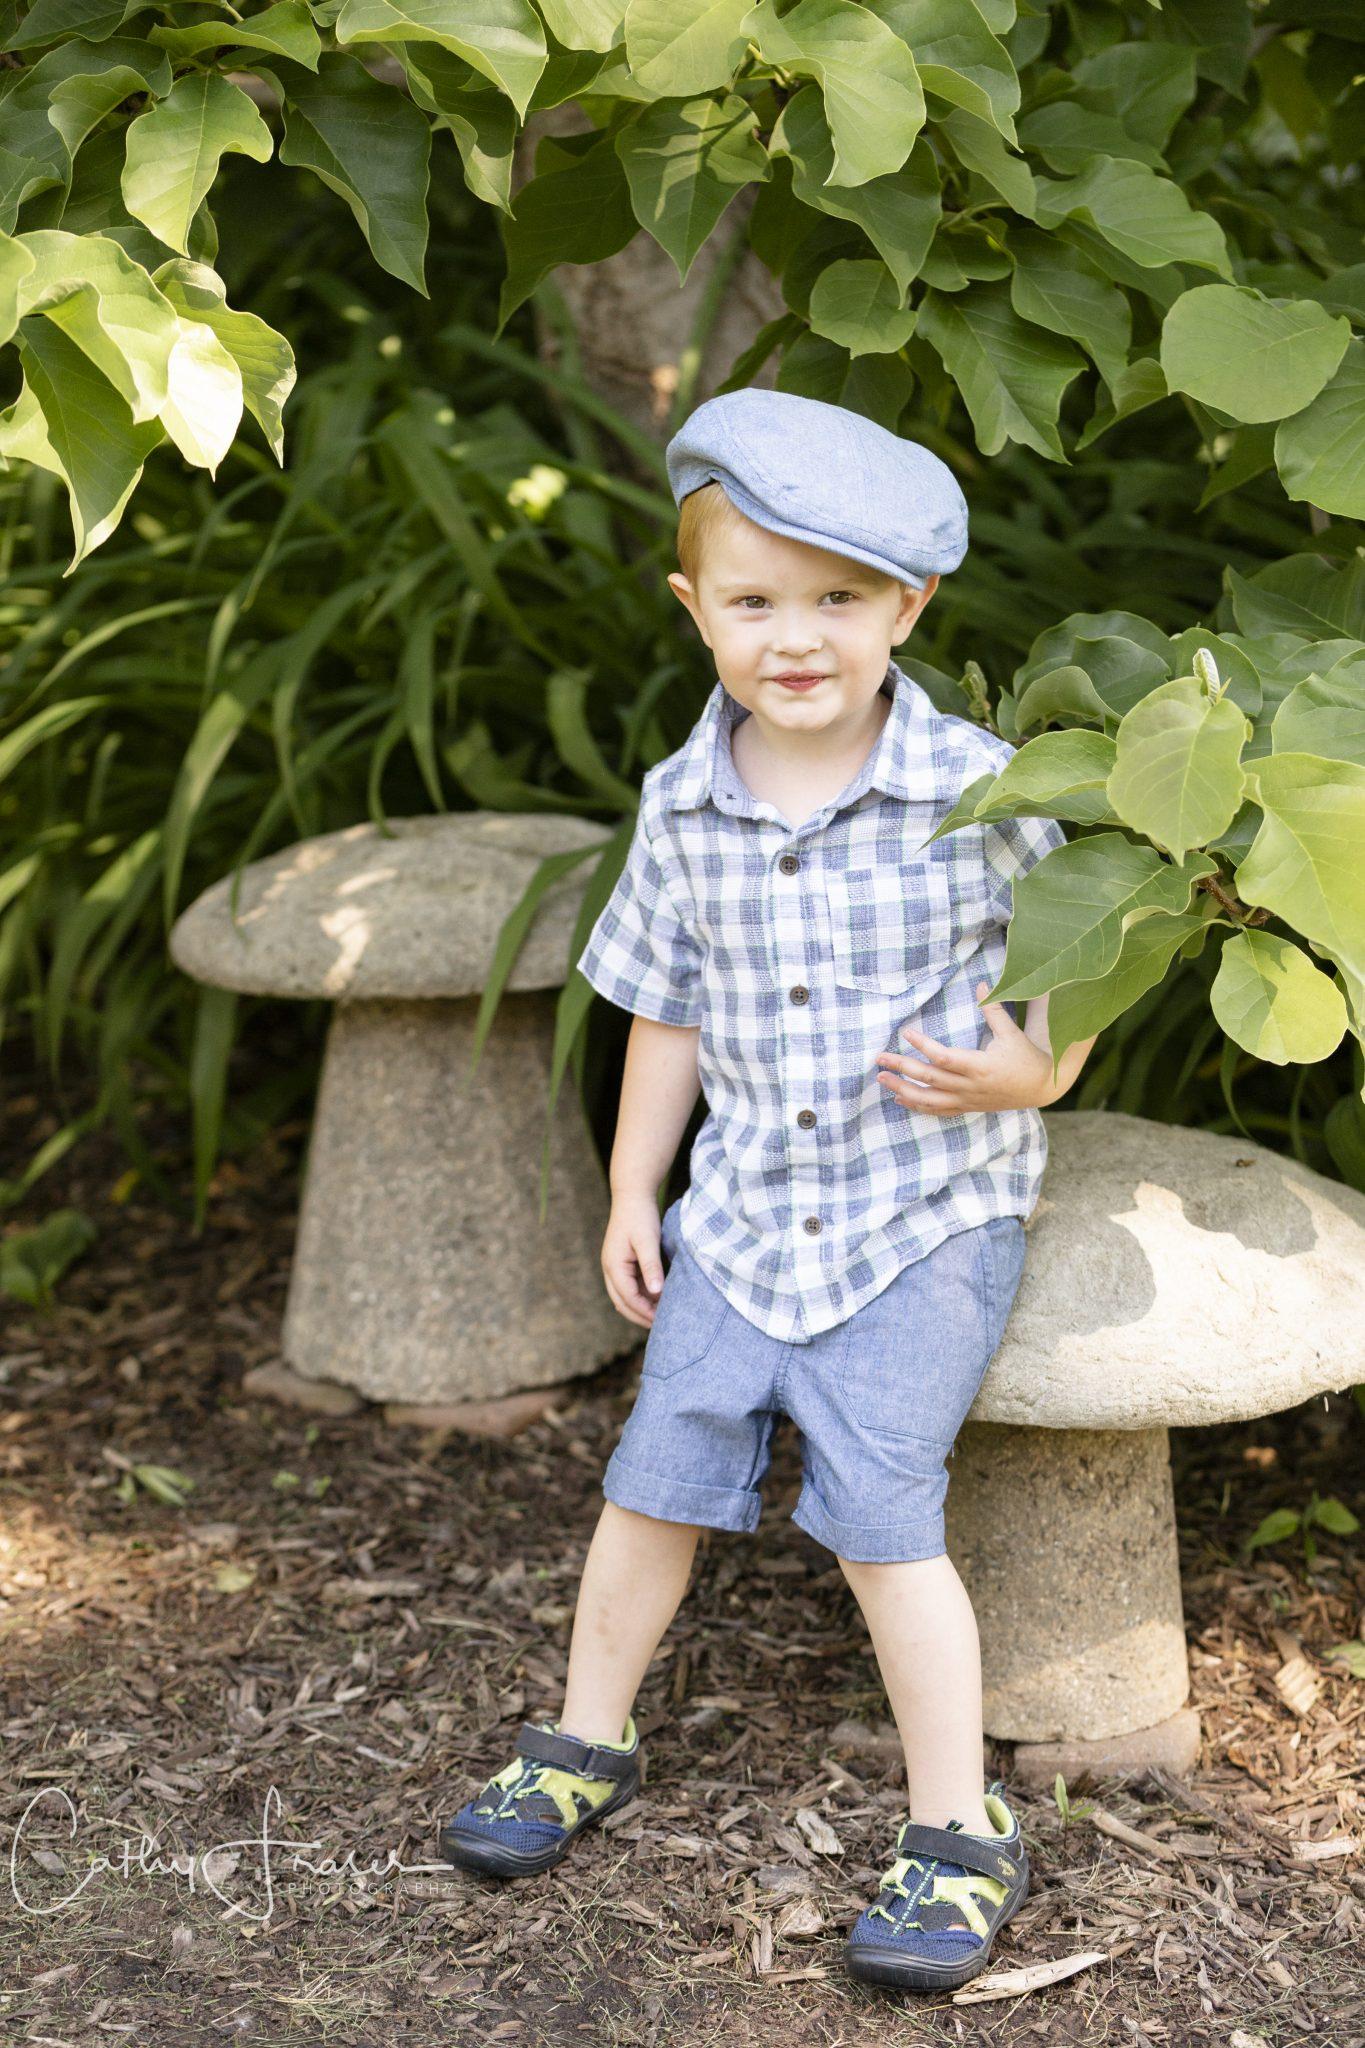 little boys, Rochester, New York, Summer, Natural Light photography, flowers